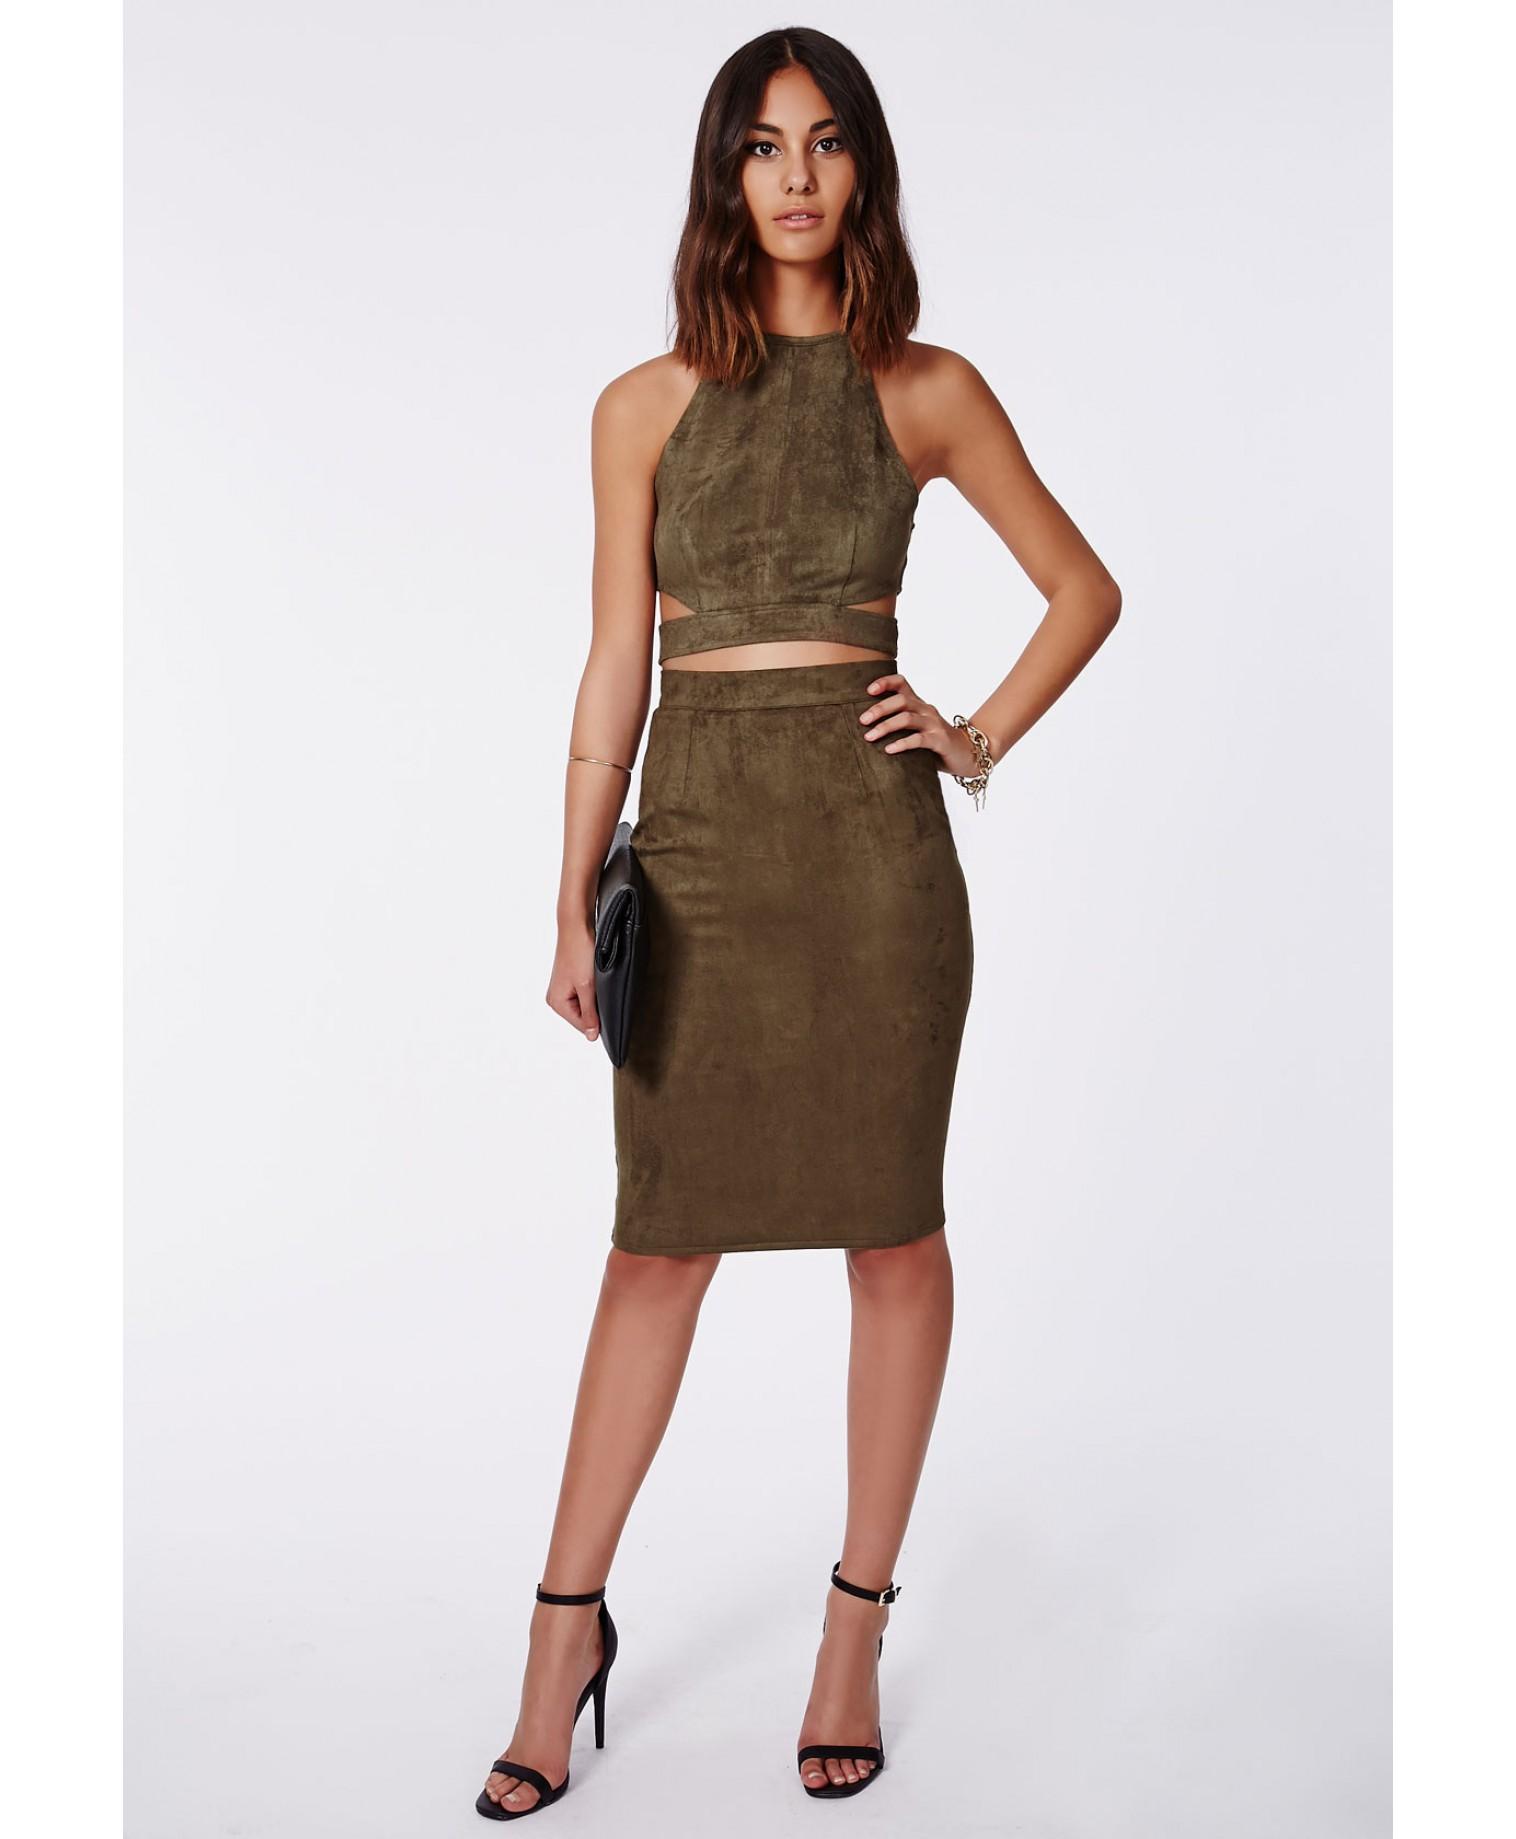 Missguided - Berryana Faux Suede Midi Skirt Khaki